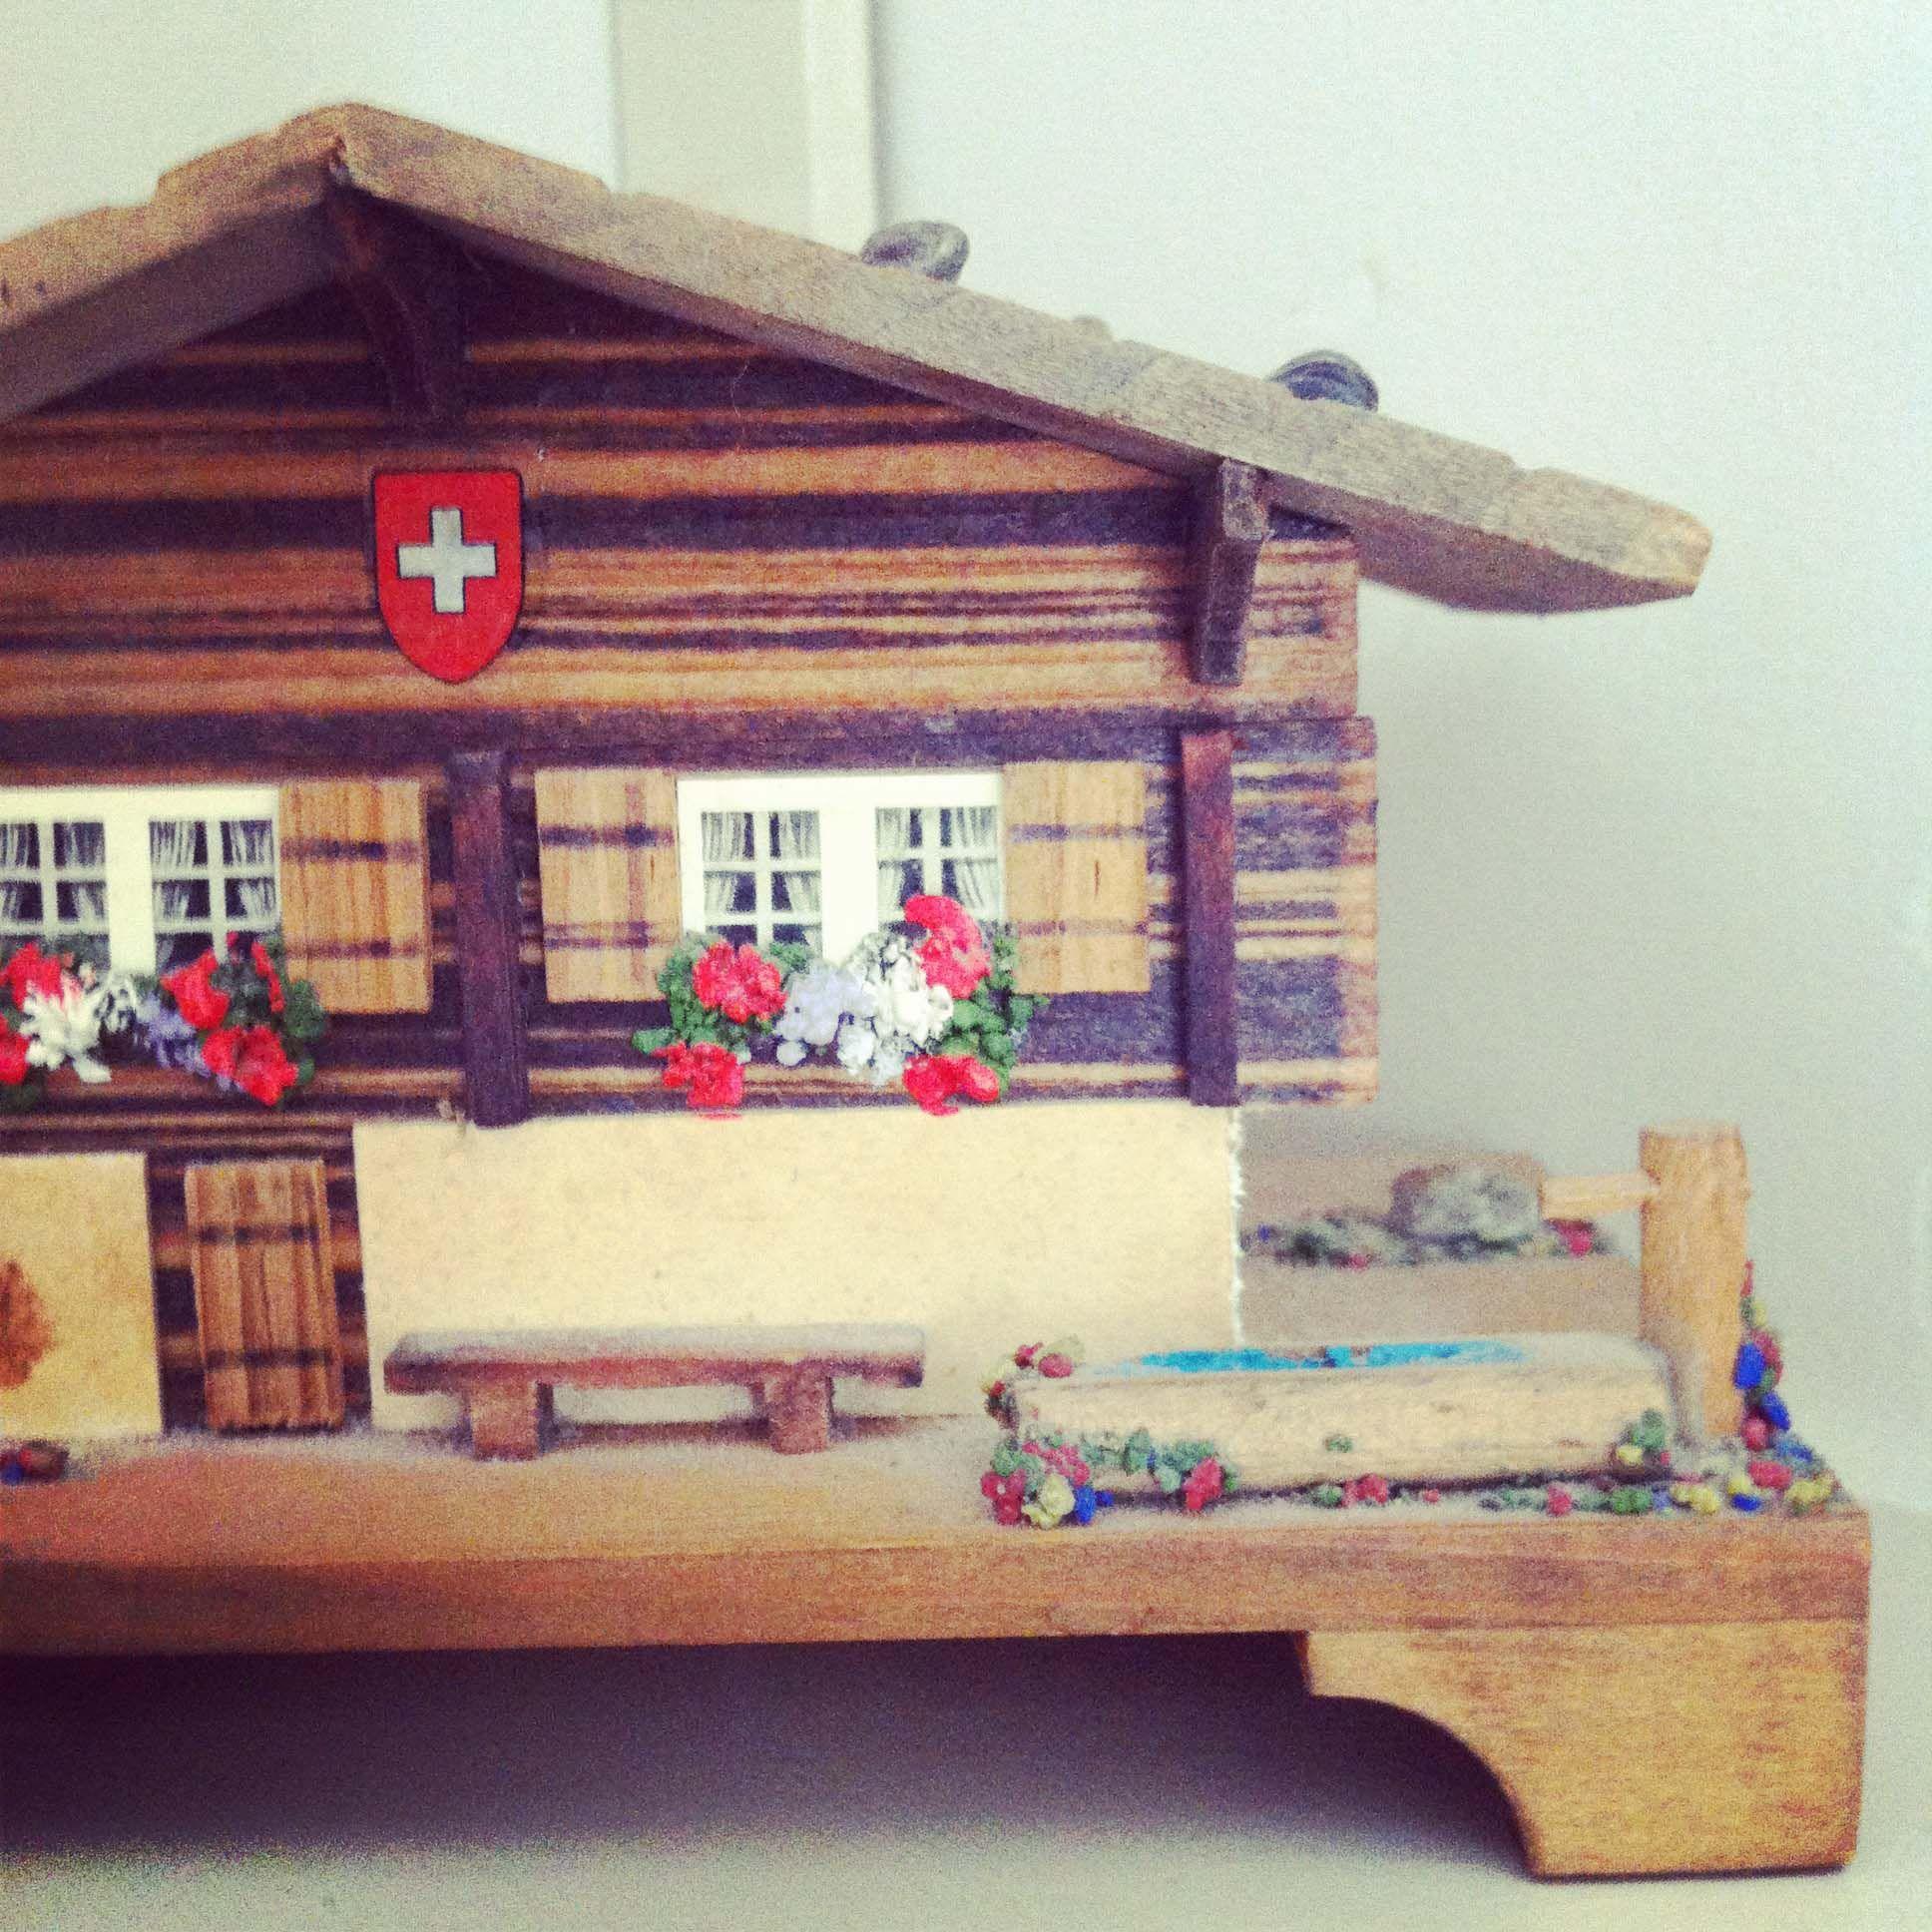 Swiss Chalet Swiss chalet, Gingerbread house, Chalet